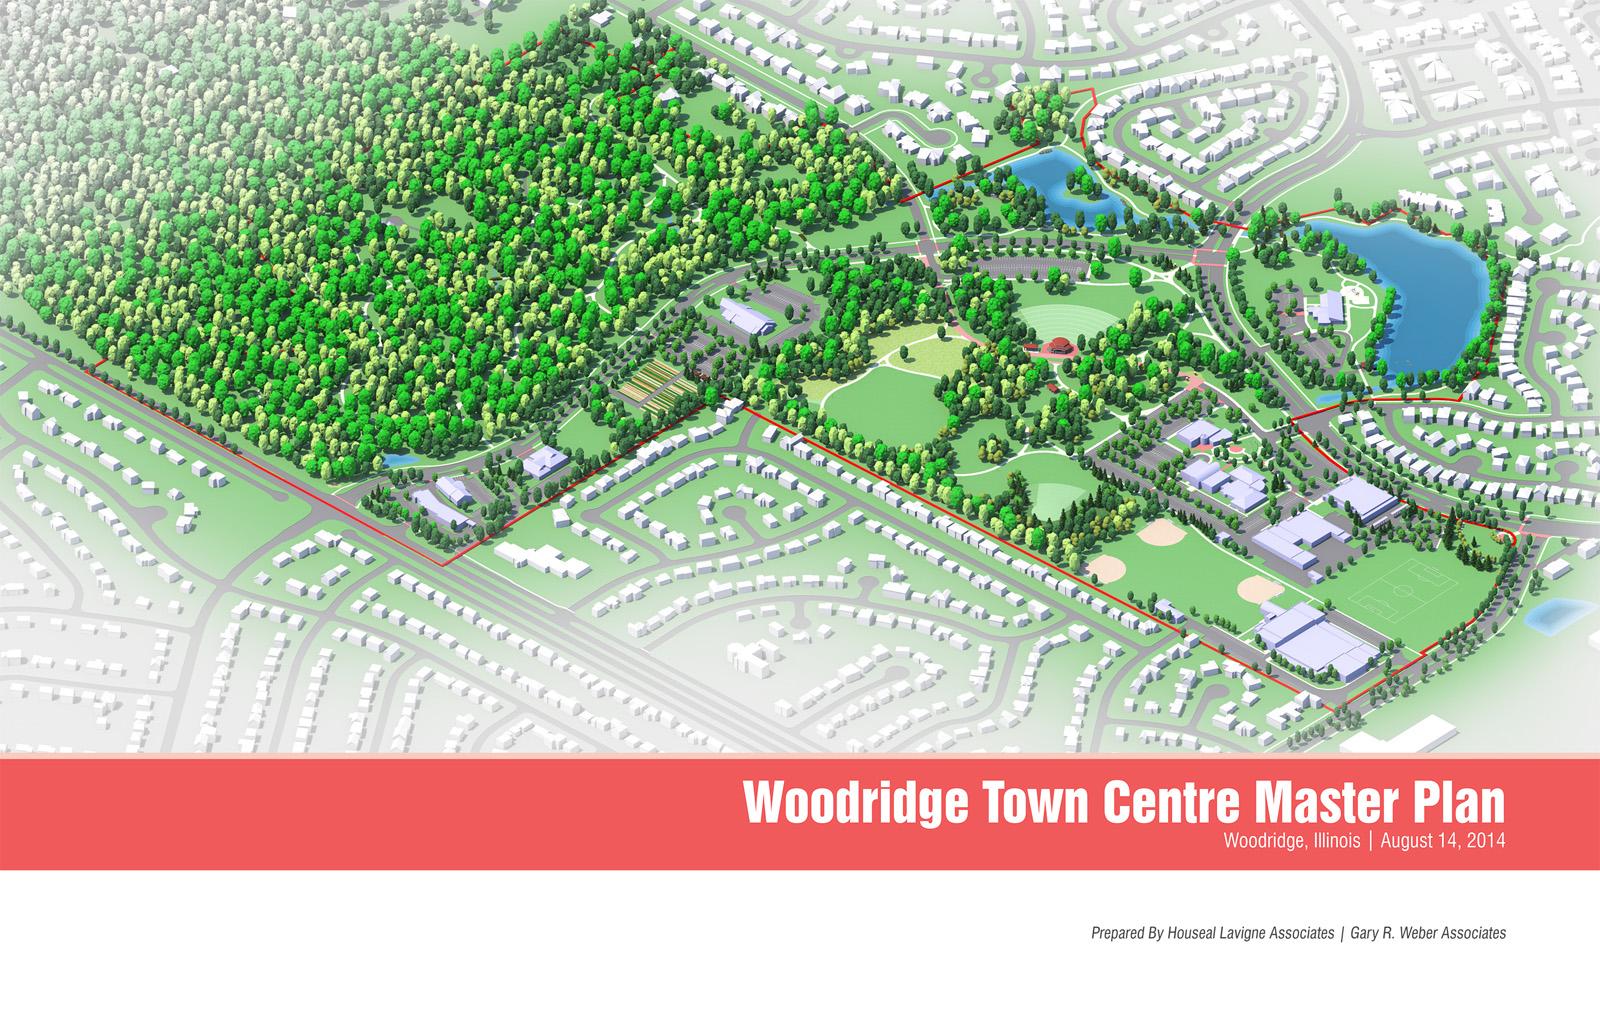 https://www.hlplanning.com/portals/wp-content/uploads/2014/10/Town-Centre-Master-Plan-1.jpg